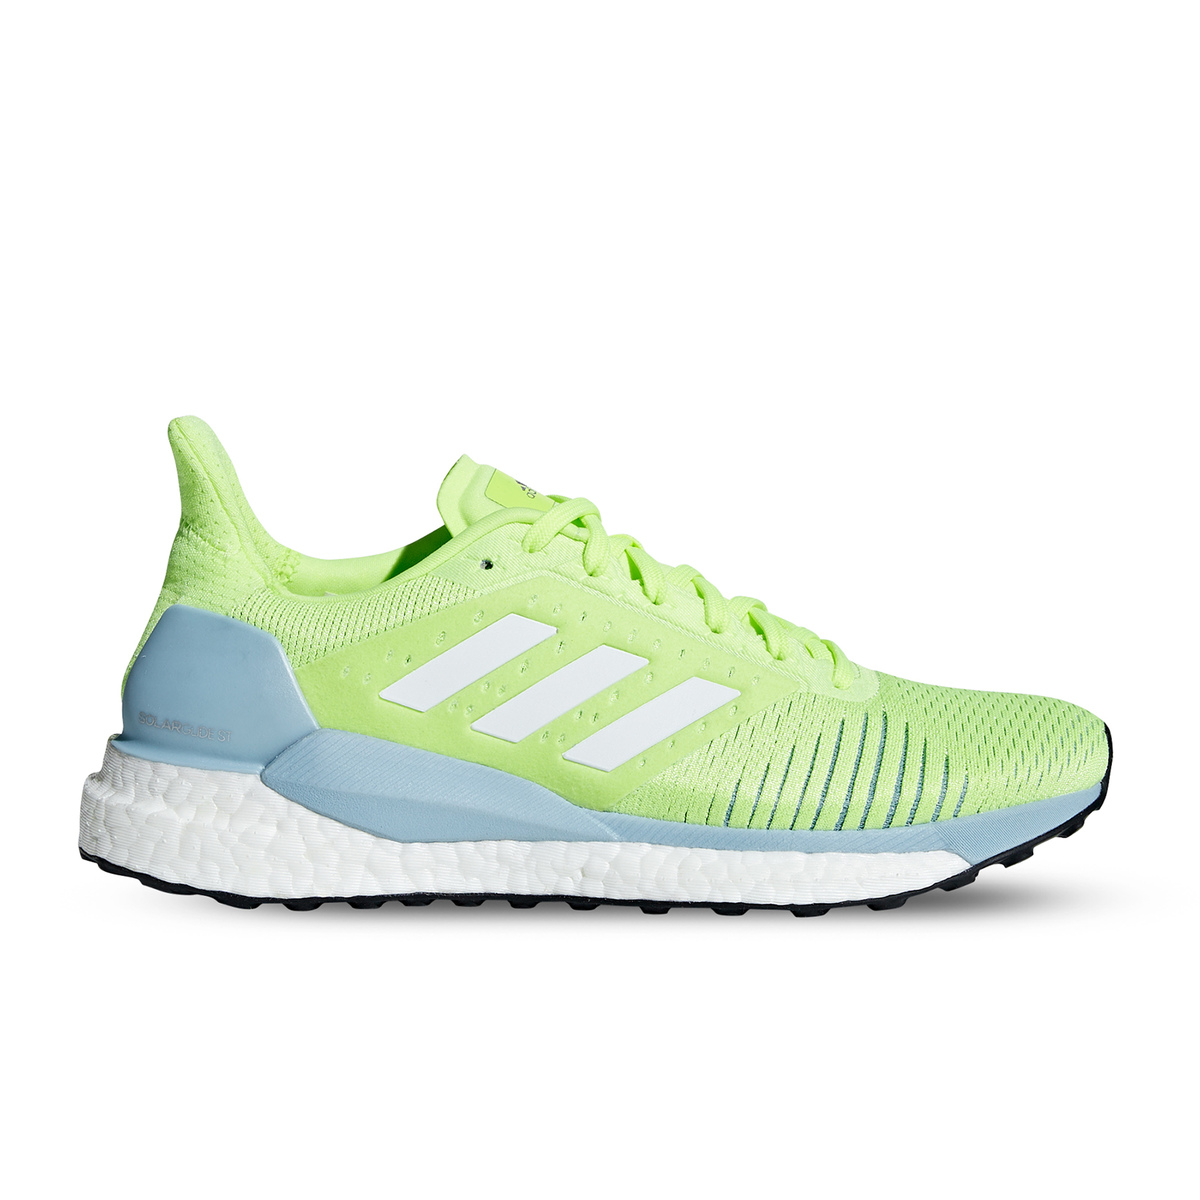 Running Opinioni Adidas Running Opinioni Scarpe Scarpe Opinioni Running Adidas Adidas Adidas Scarpe nkXOP80w